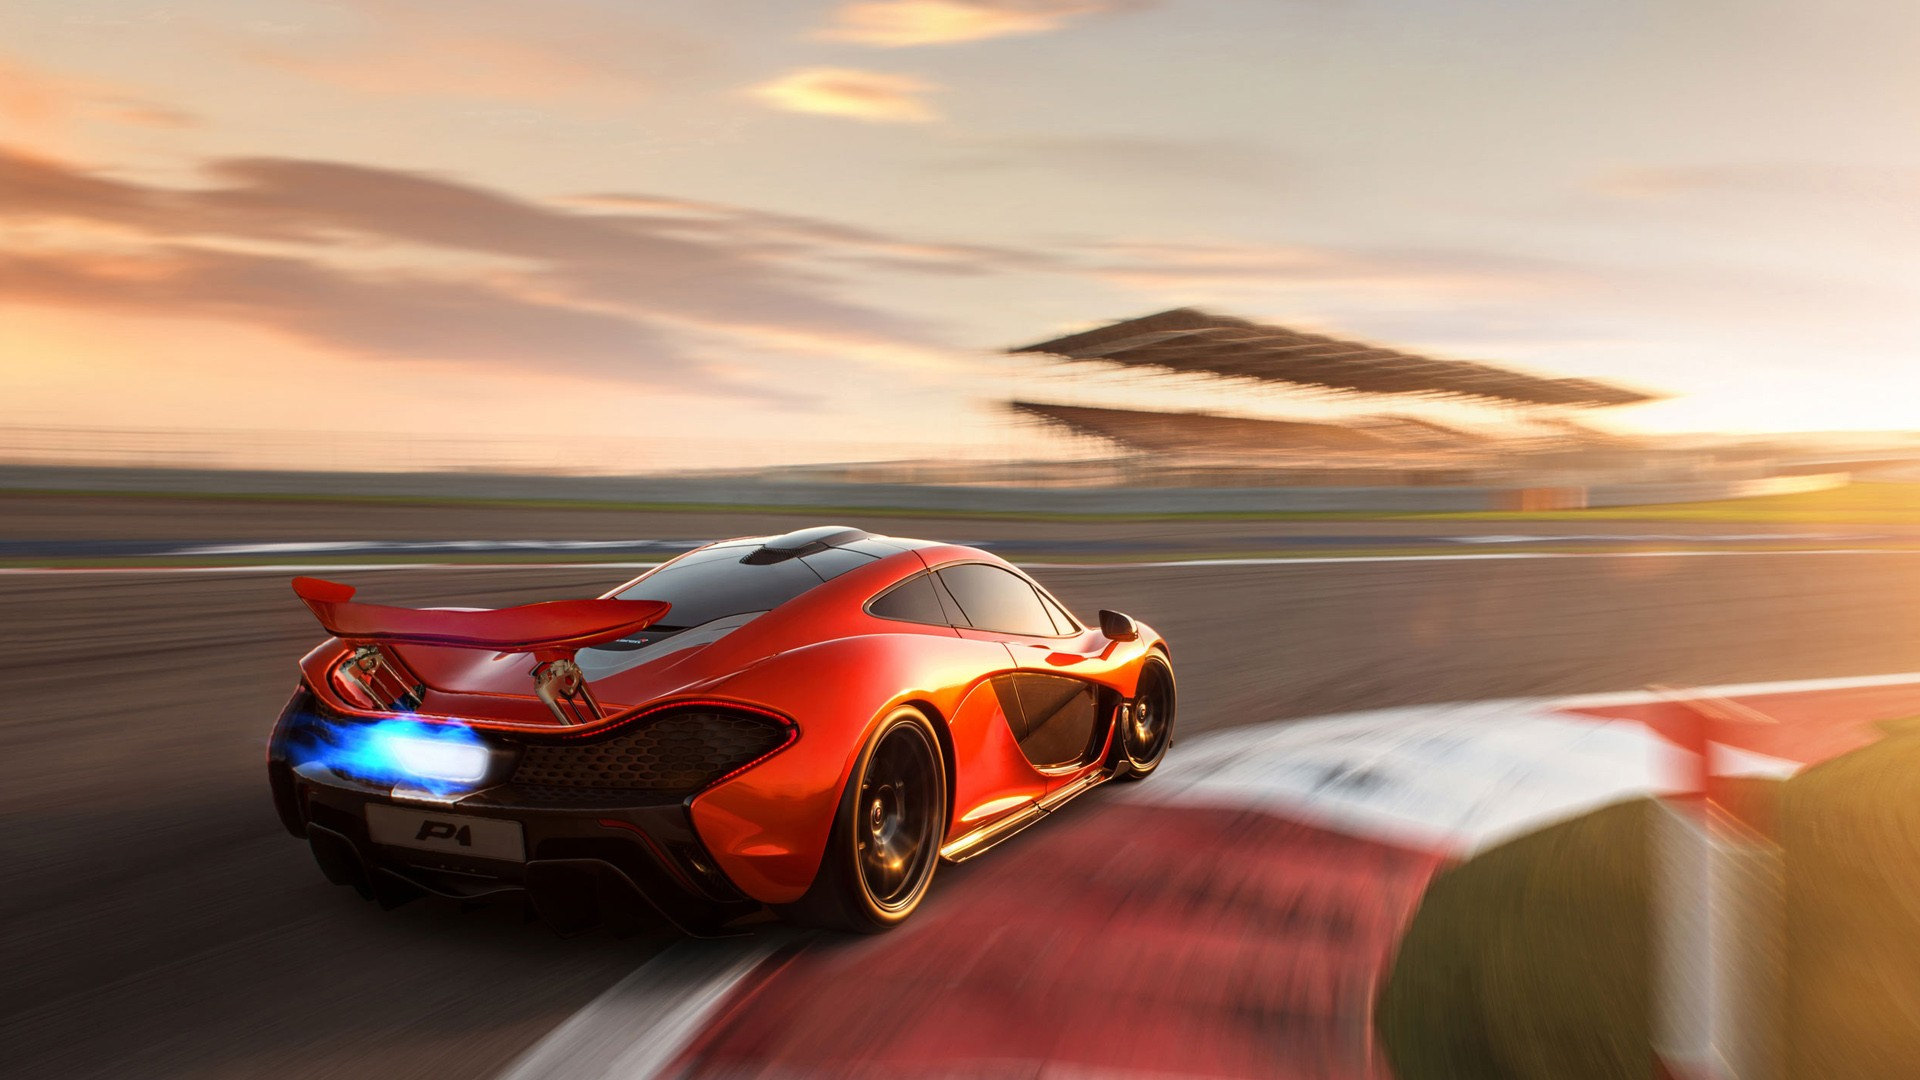 McLaren P1 Concept Wallpaper | HD Car Wallpapers | ID #3388